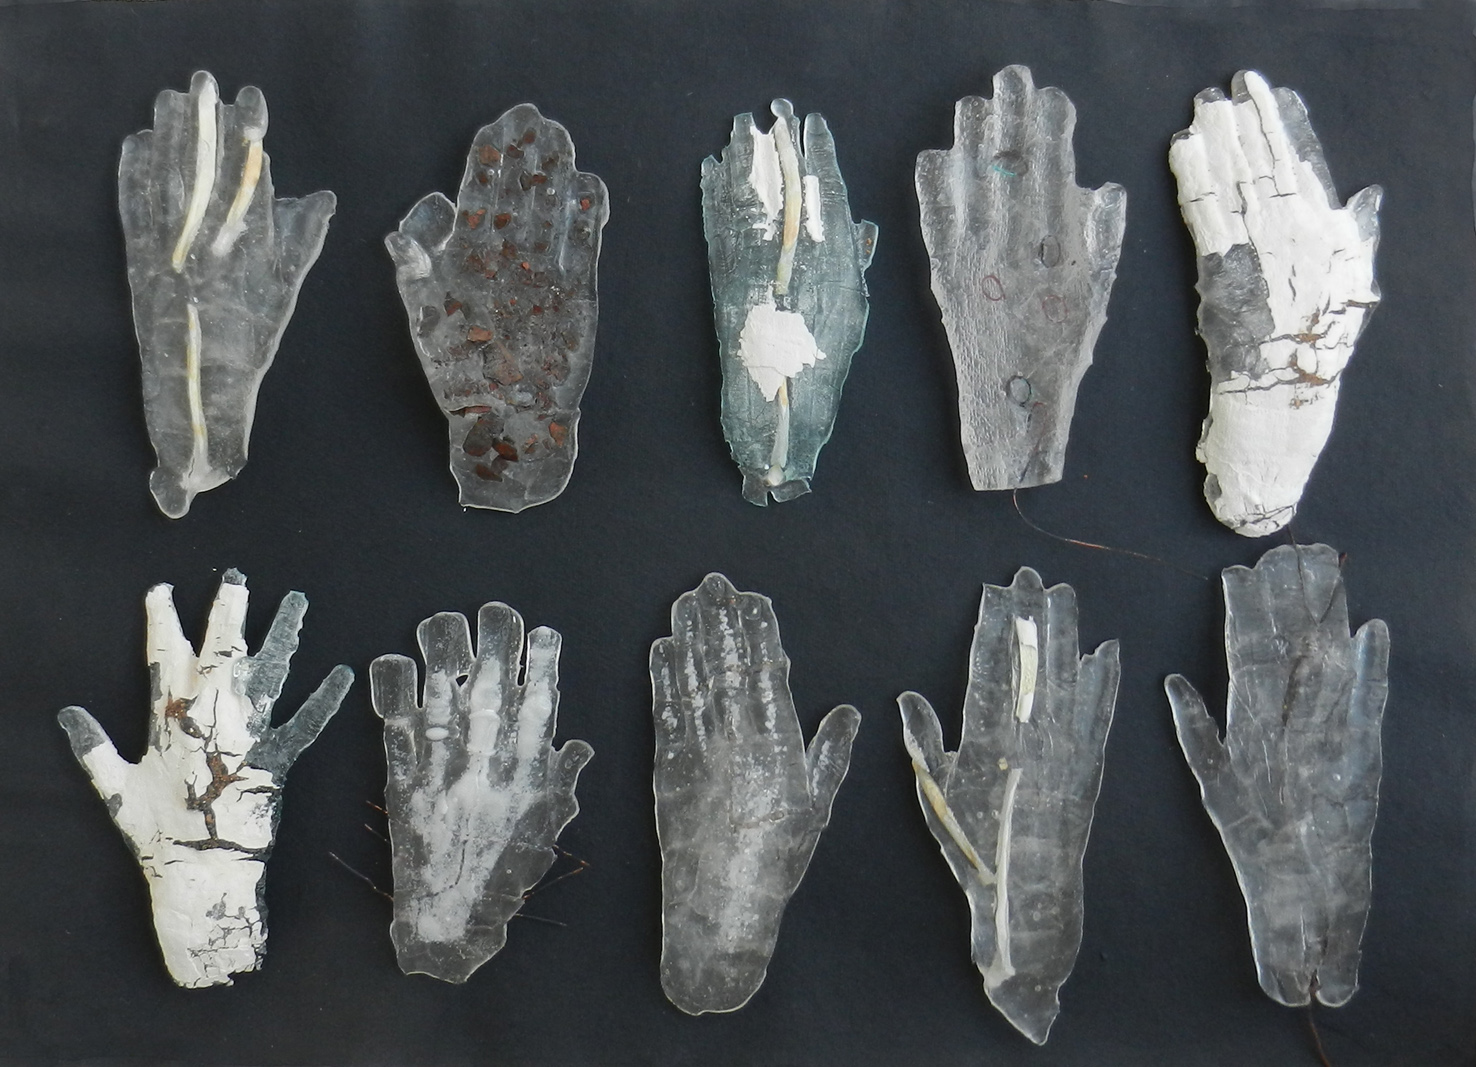 Untitled Glass, wire, bone, etc, ten pieces approx 25 cm each, 2018